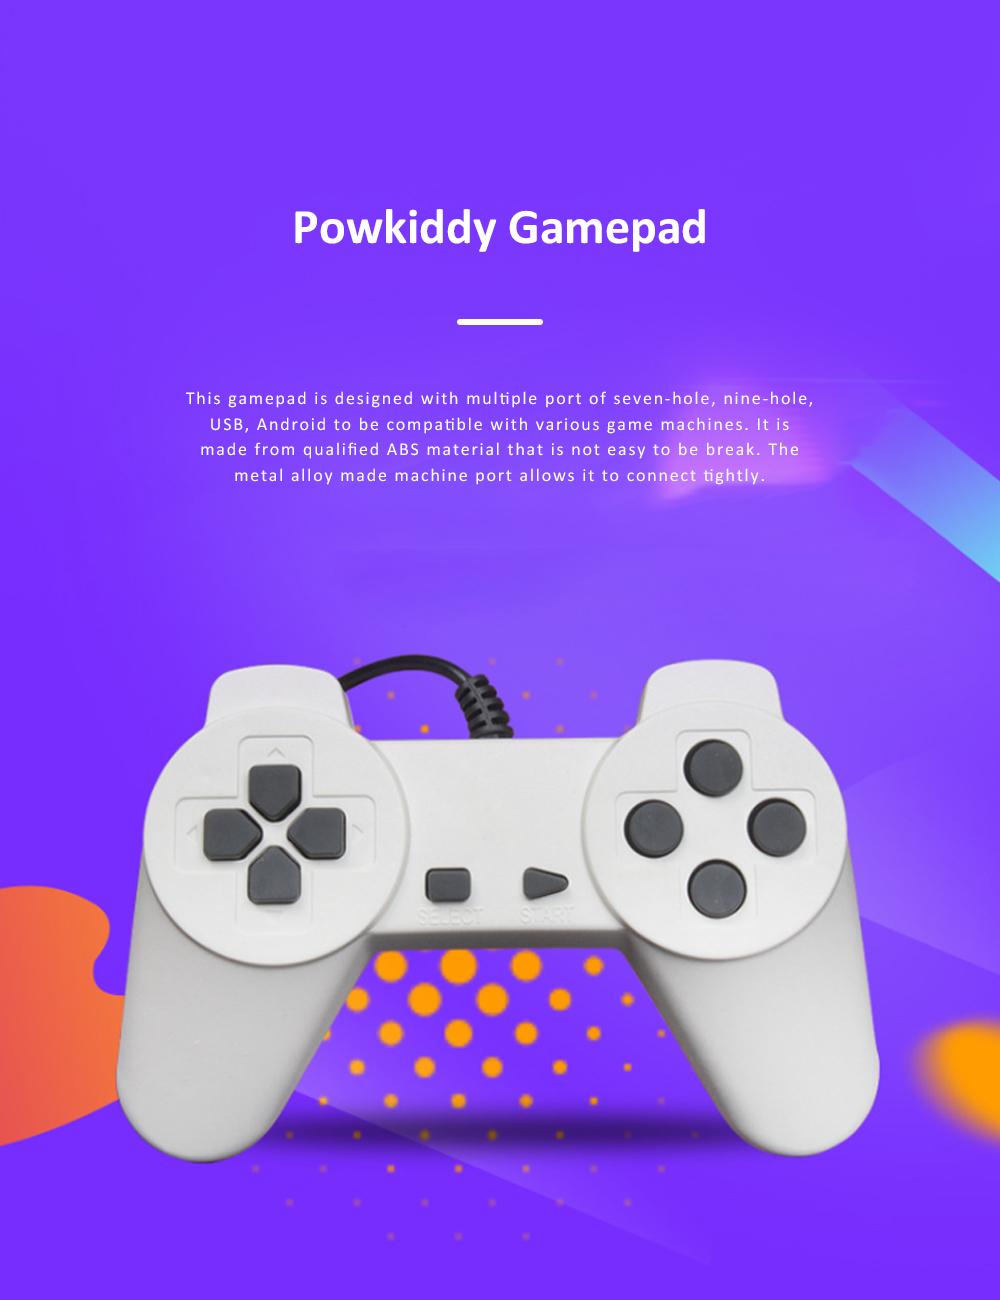 Powkiddy Gamepad Multiple Port Designed Joy Stick Compatible for D101 D99 D68 Game Machines 0